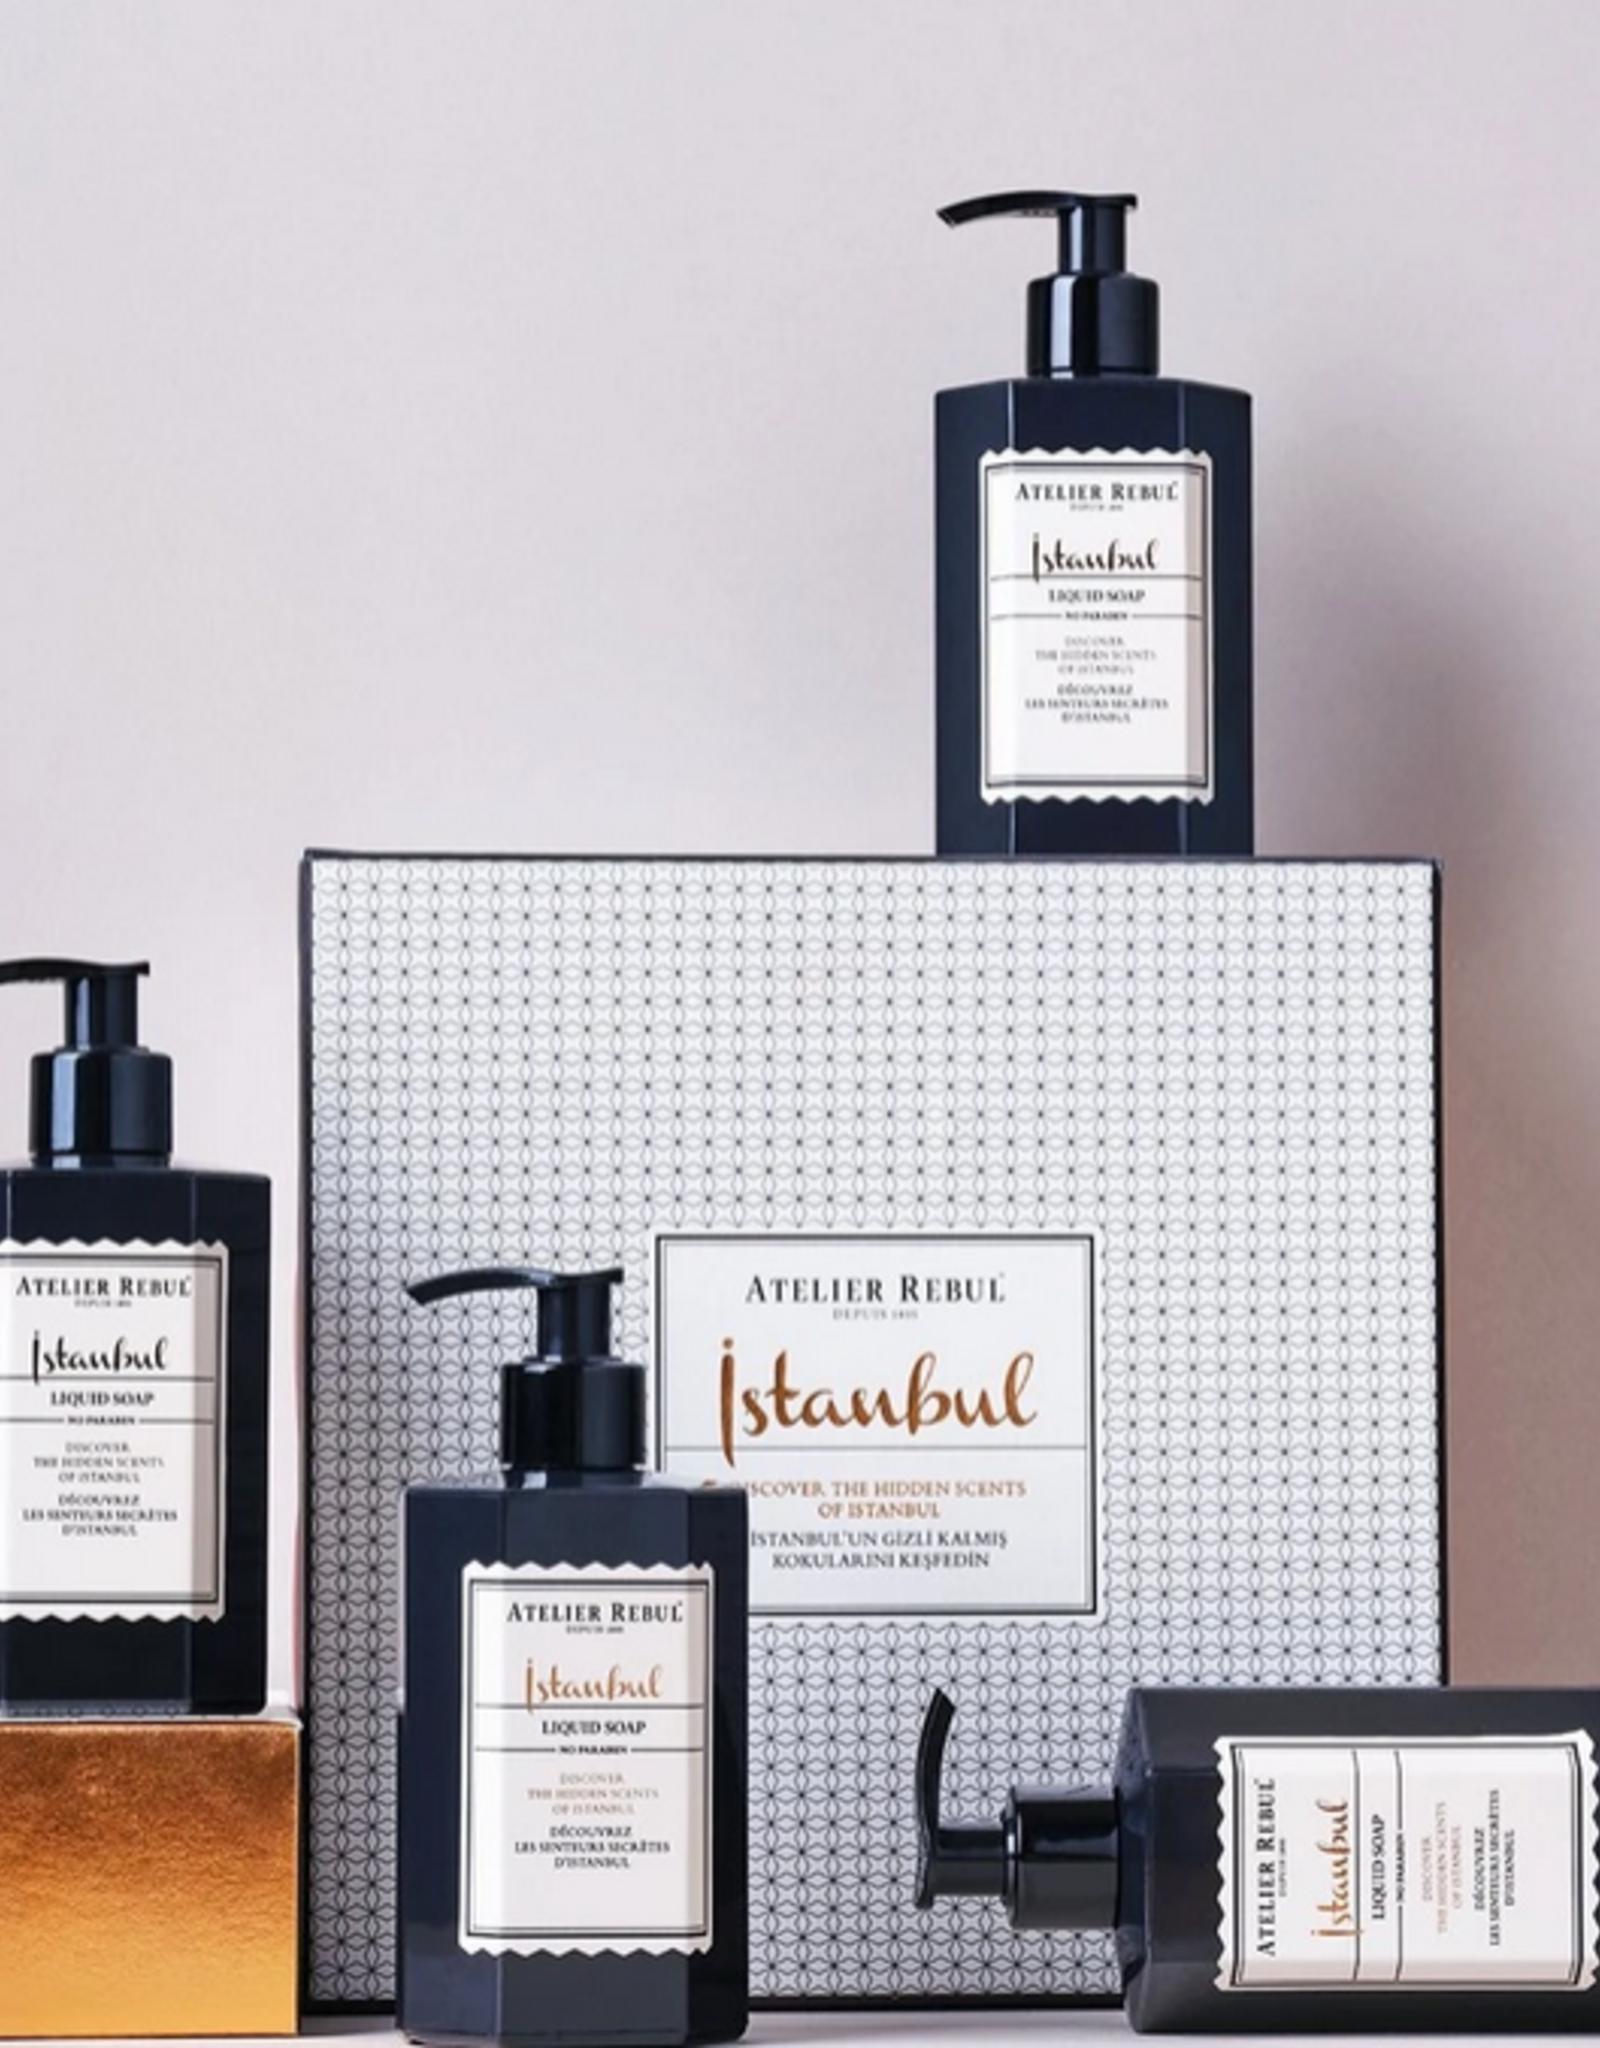 Atelier Rebul Atelier Rebul - Istanbul Liquid soap- 250ml